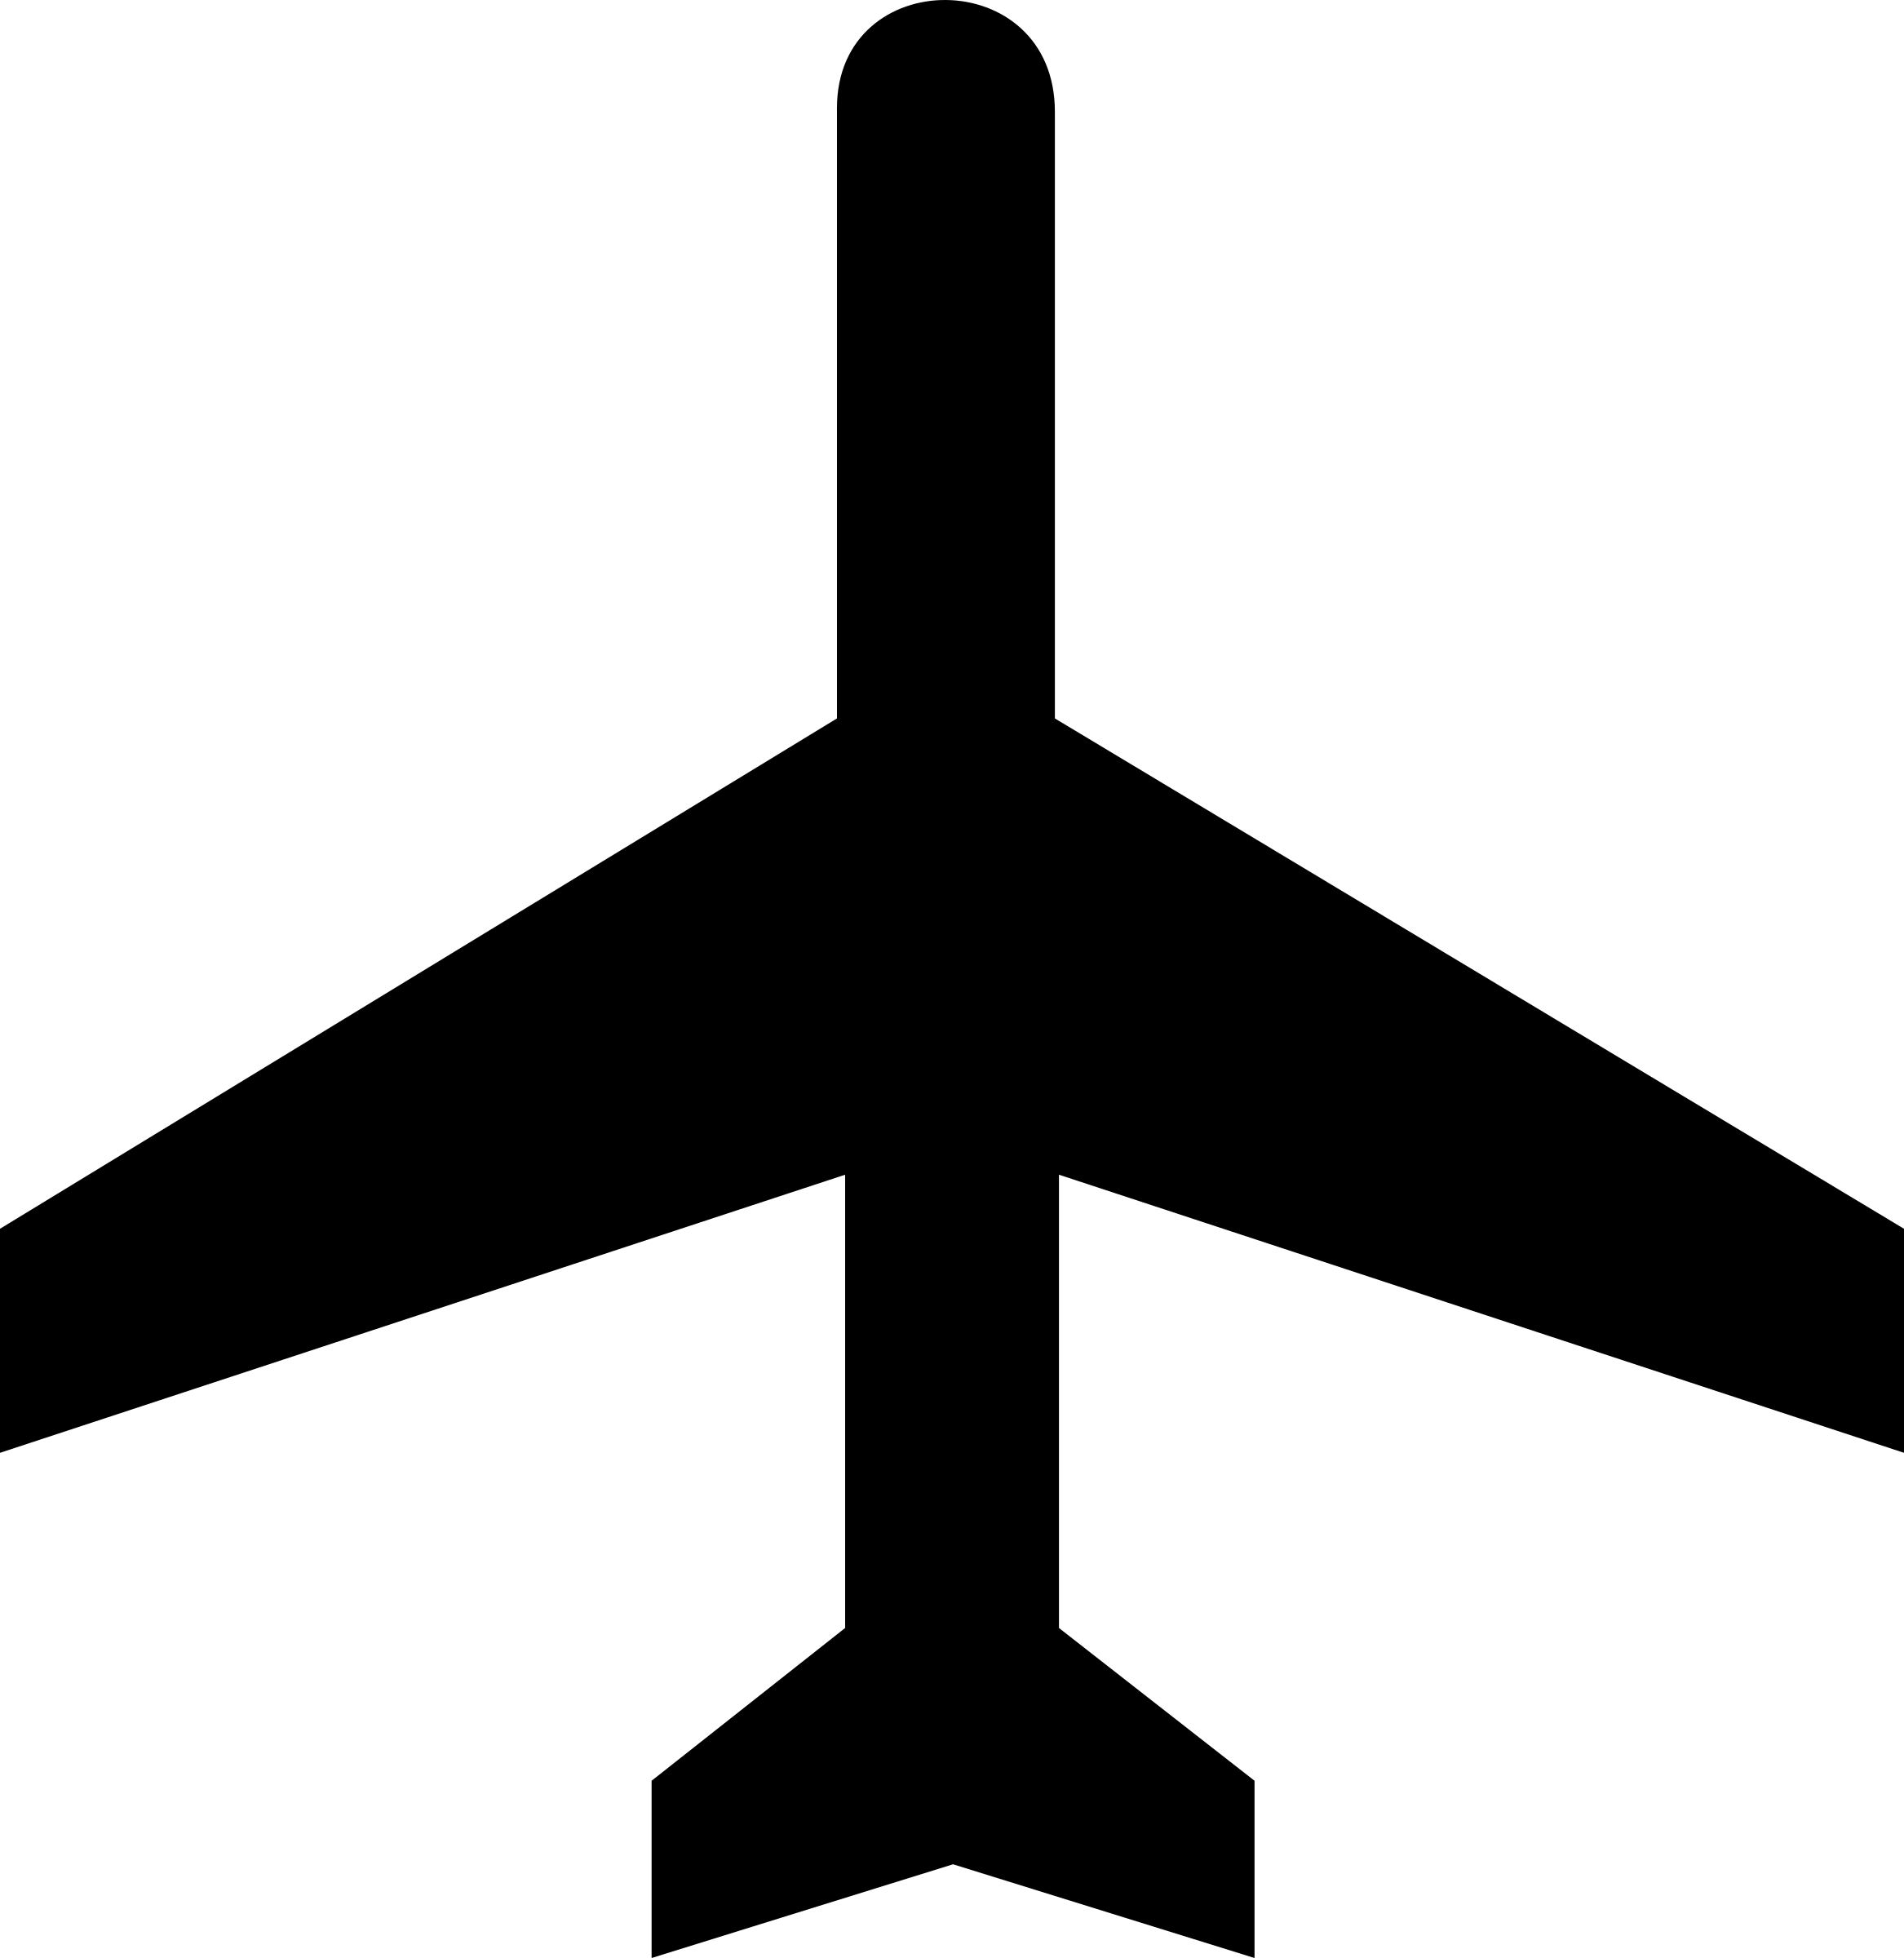 Transportation clipart airplane symbol. Aiga air big image